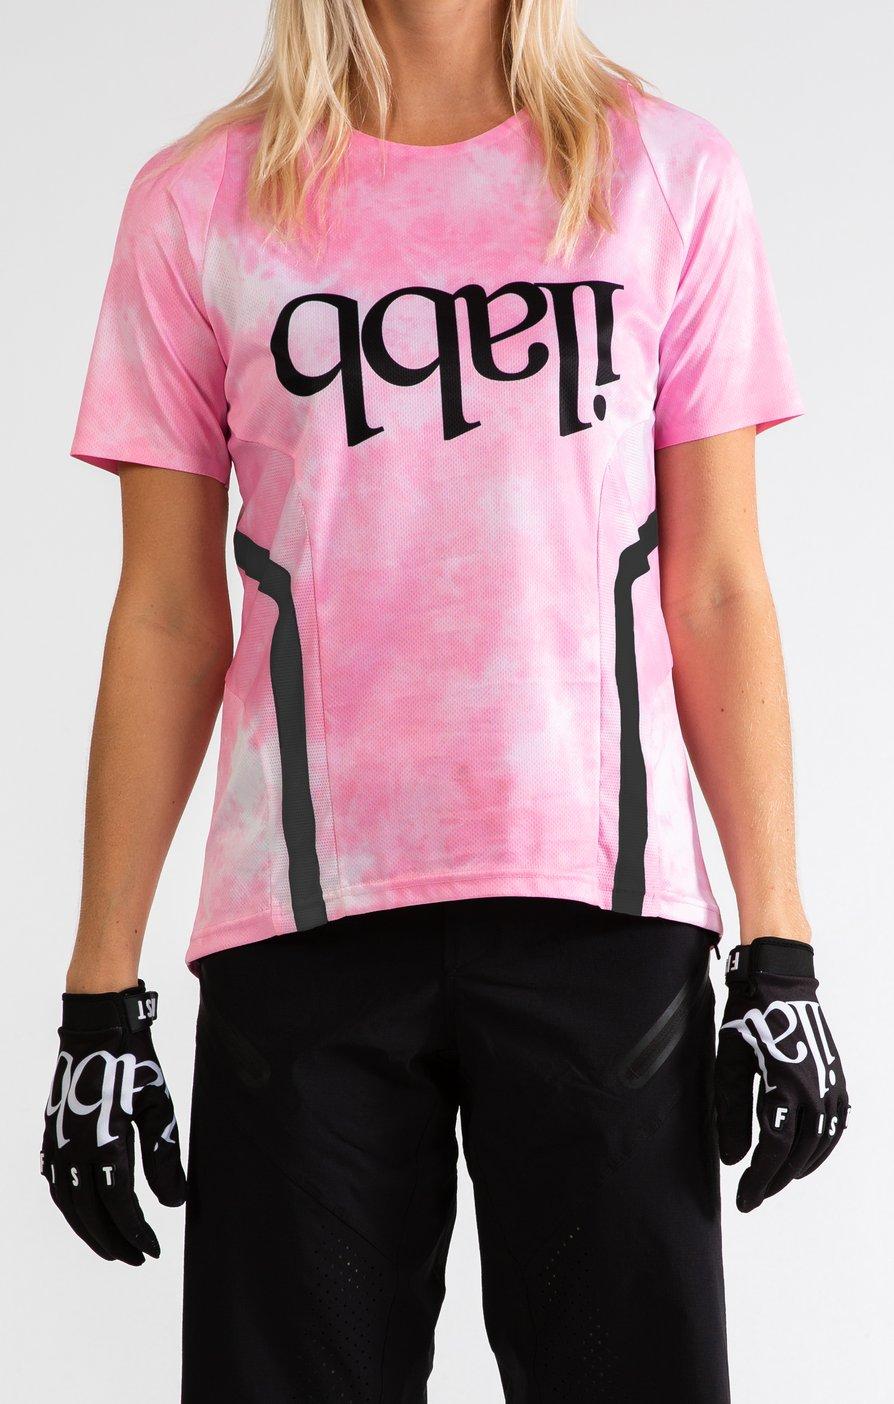 Don Race Tee Womens - Pink Tie Dye ライドシャツ